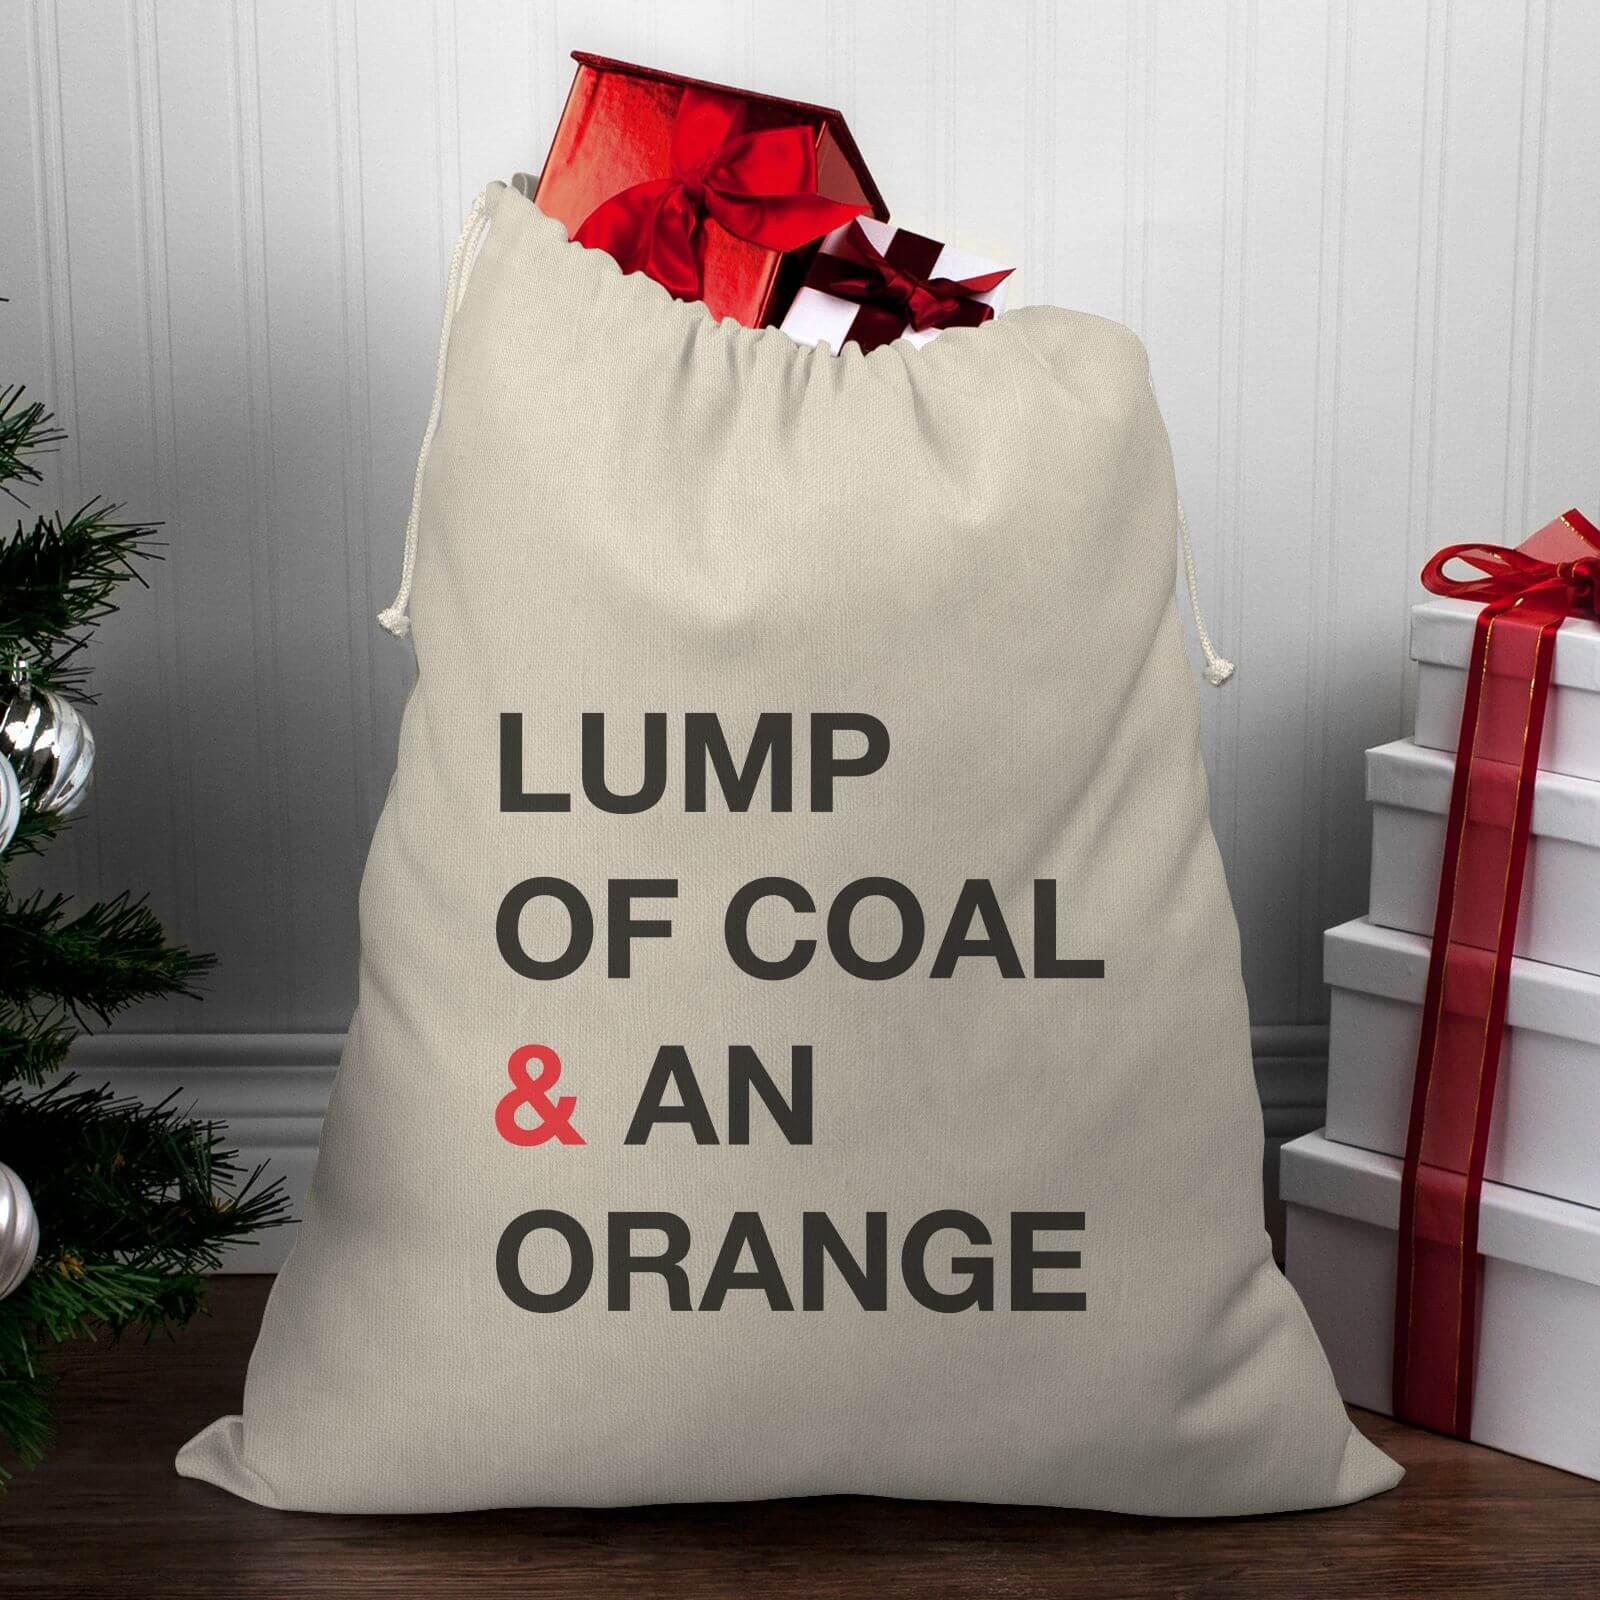 Lump Of Coal For Christmas.Lump Of Coal An Orange Christmas Santa Sack